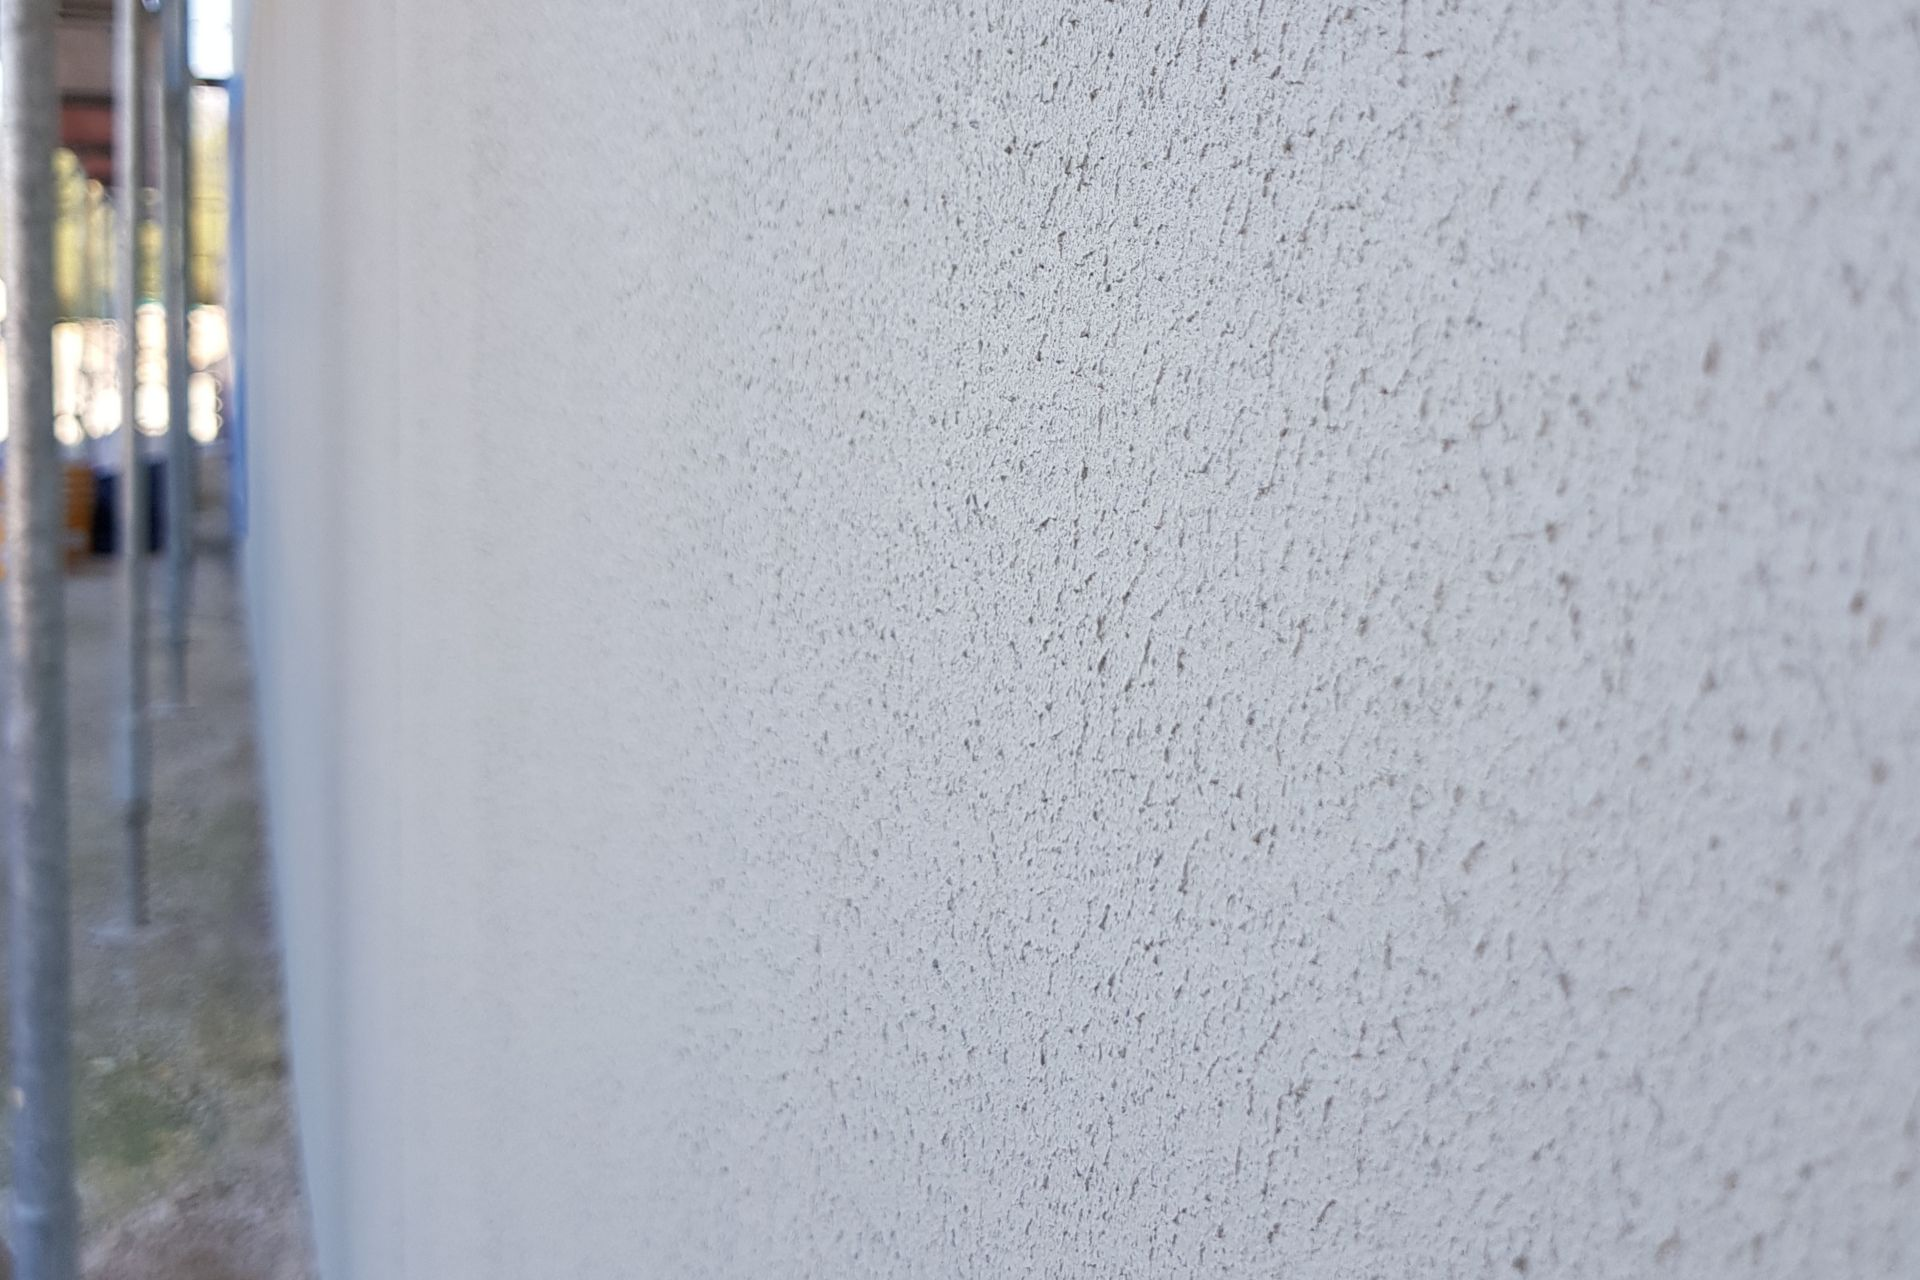 Schutz gegen Karbonatisierung des Betons